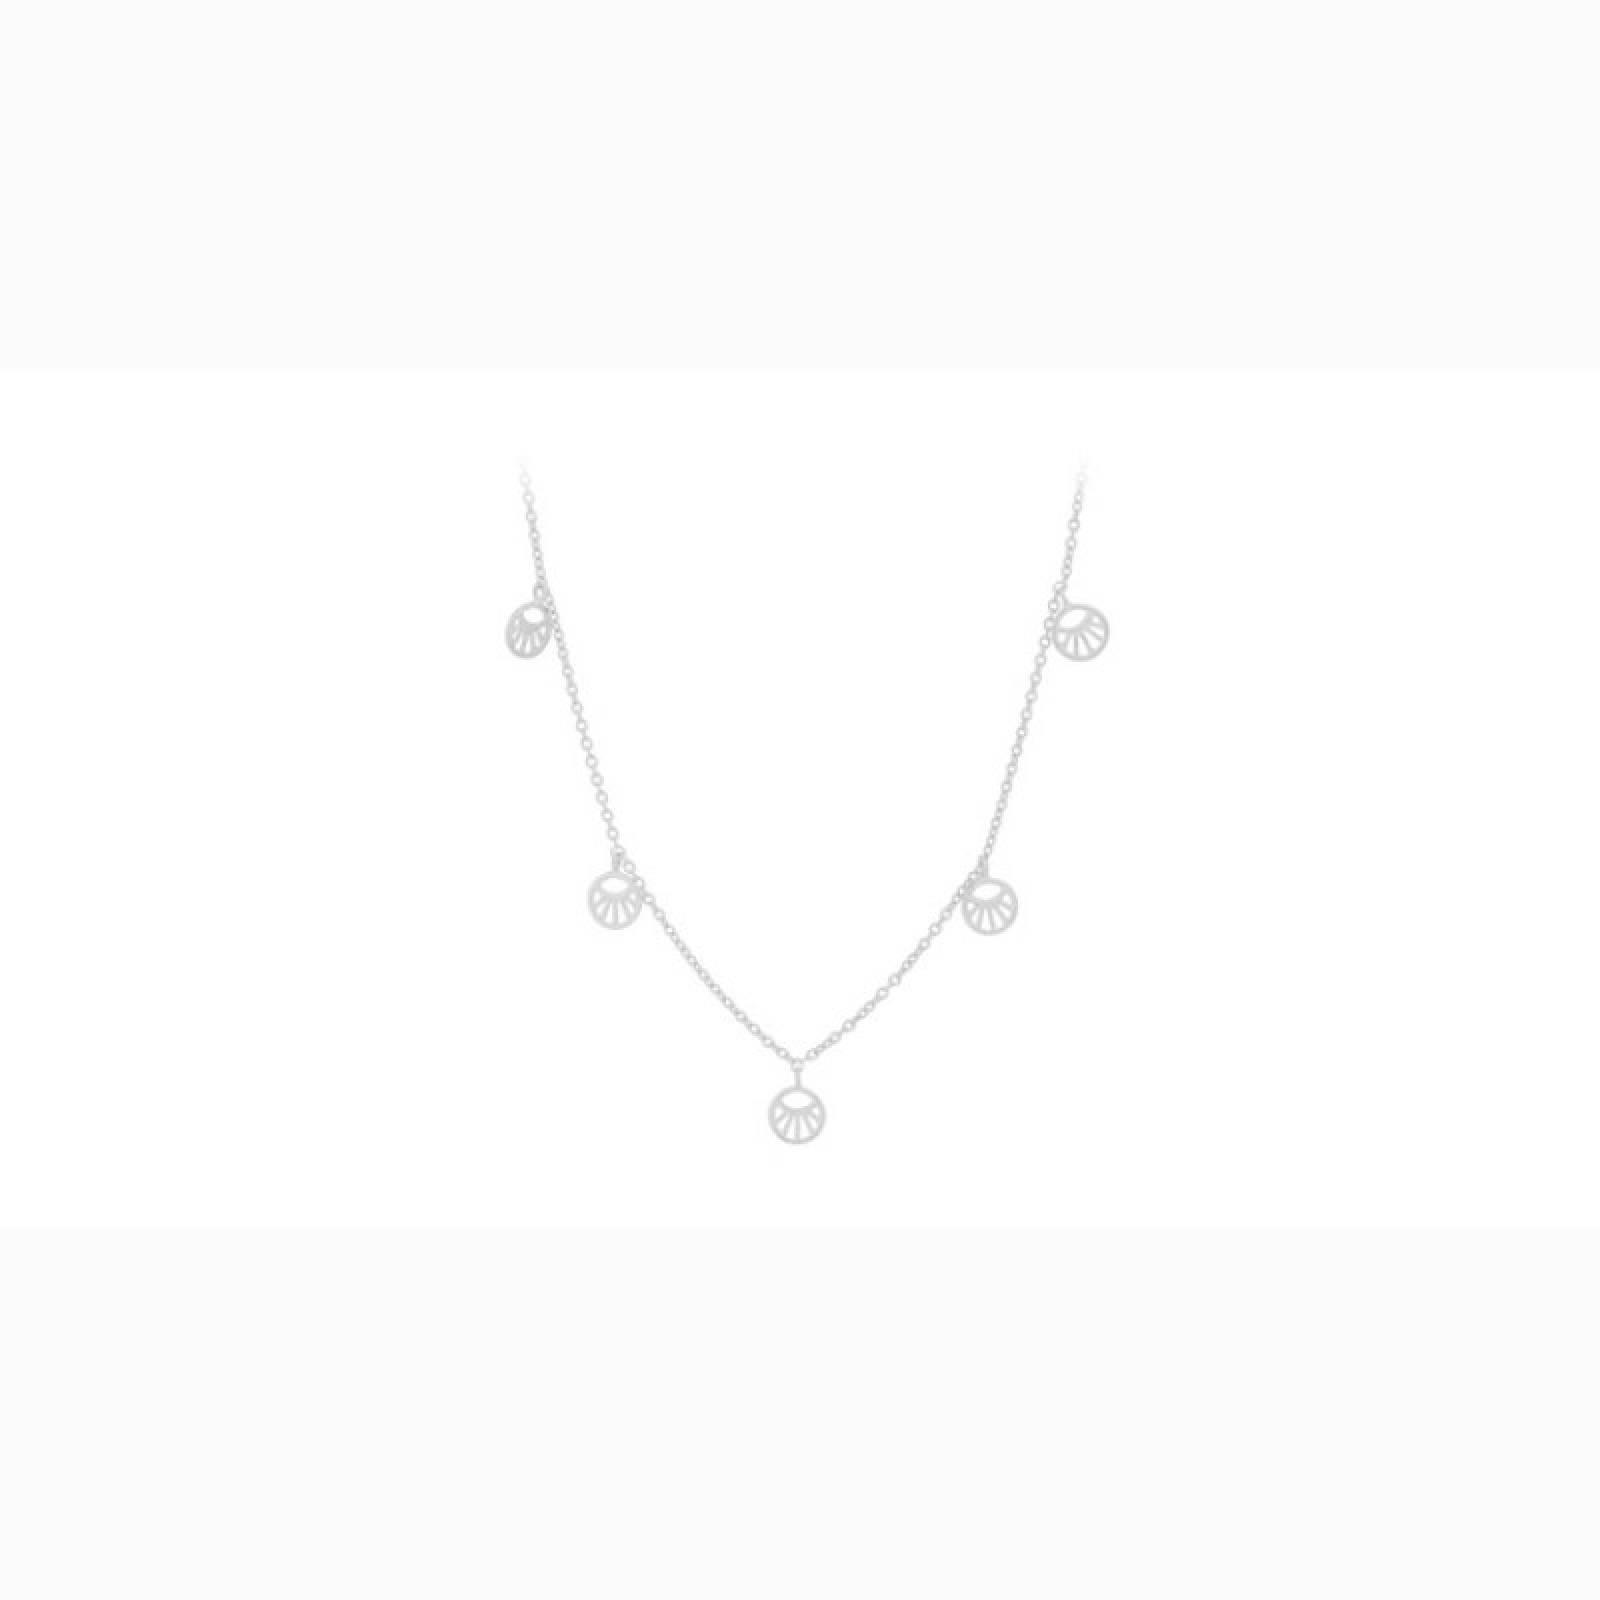 Mini Daylight Necklace In Silver By Pernille Corydon